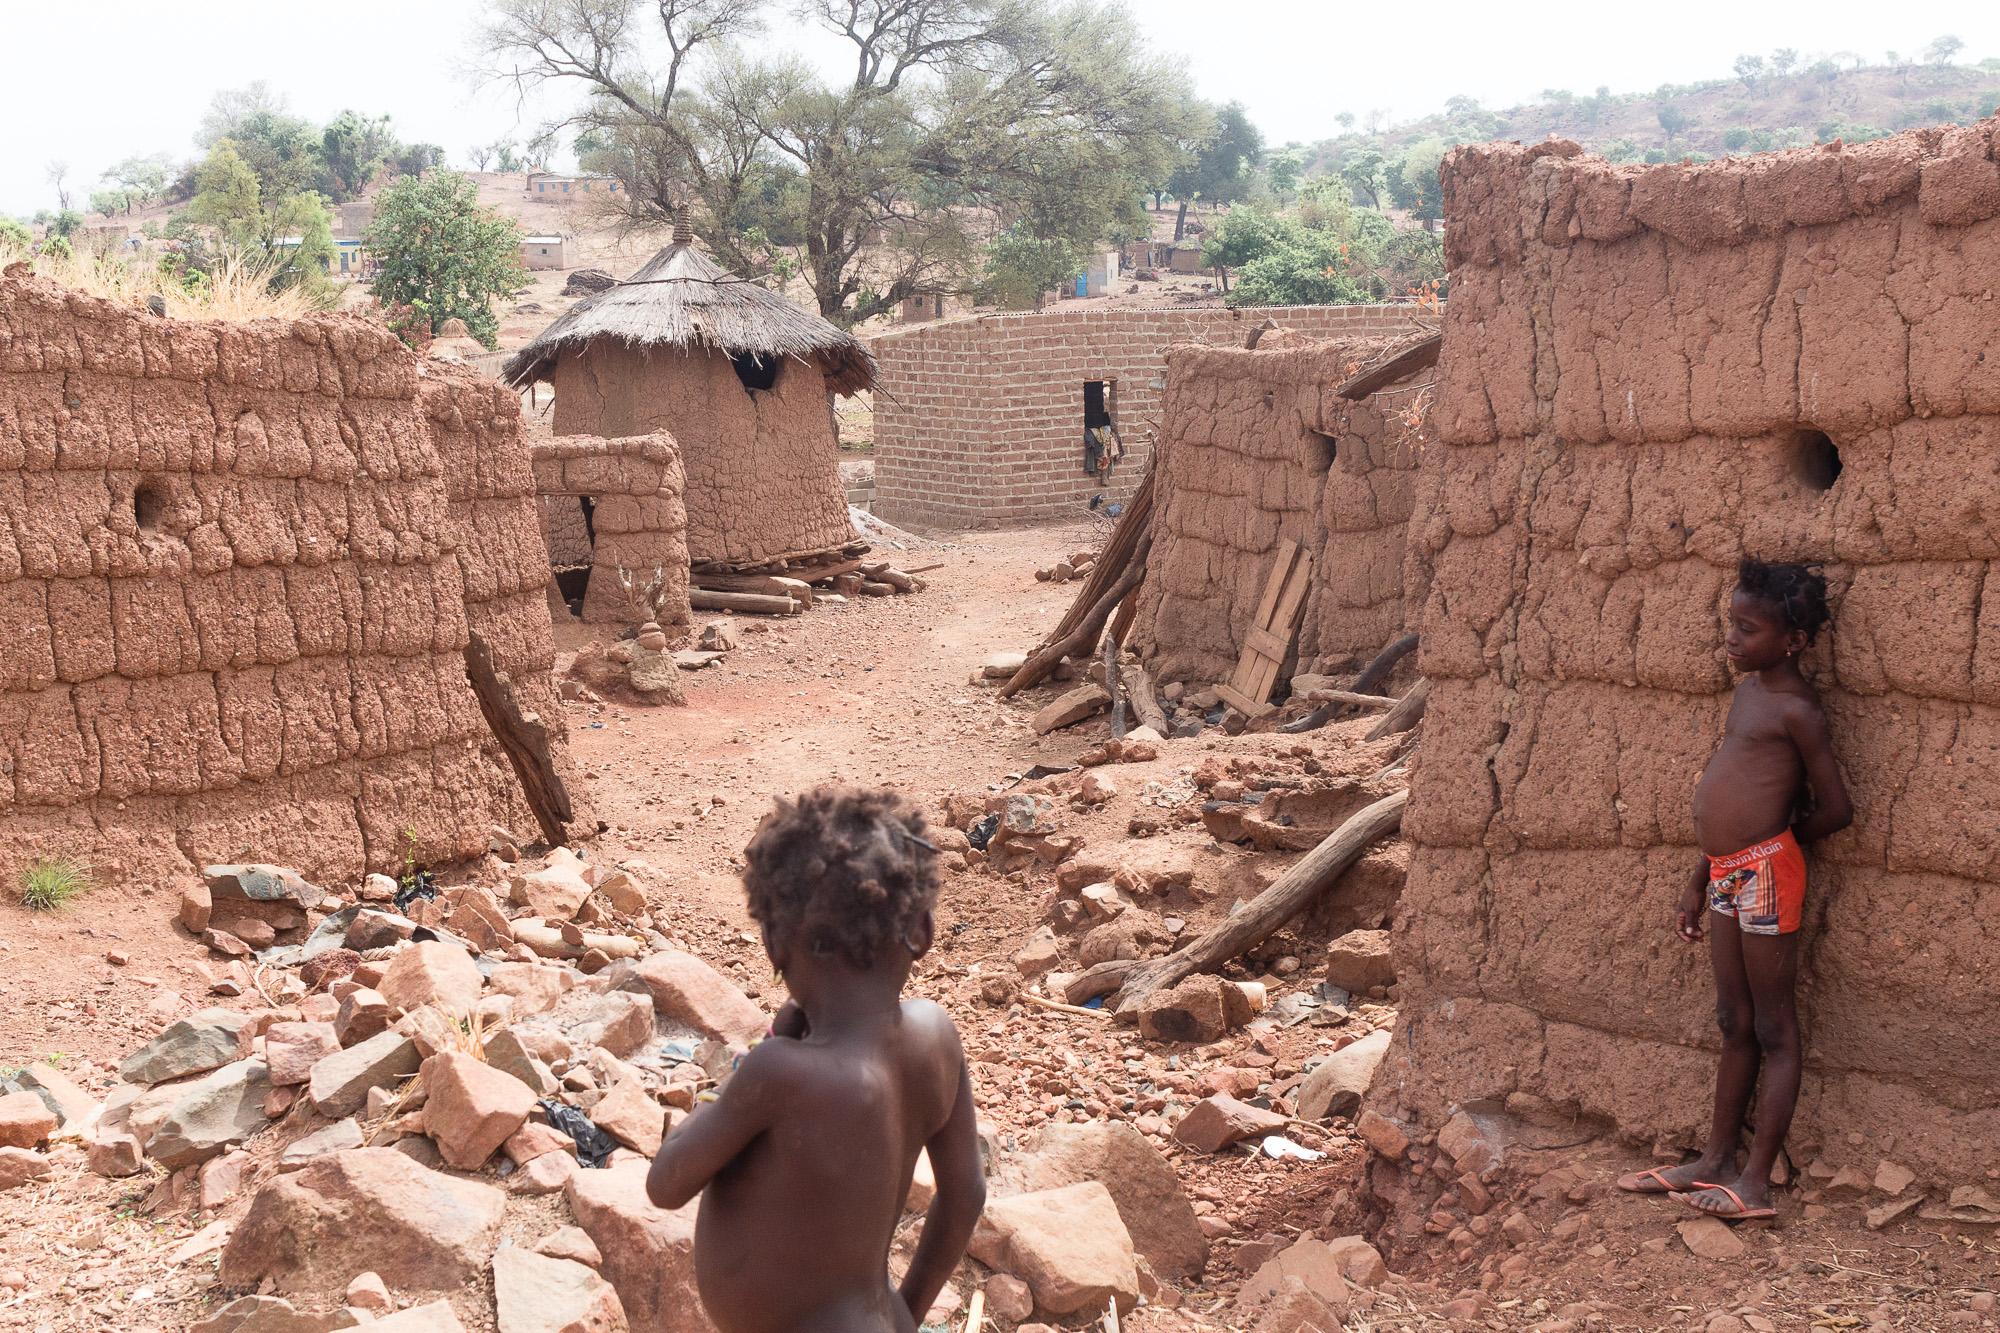 Fillettes dans les rues du village Lobi de Sansana, Burkina Faso